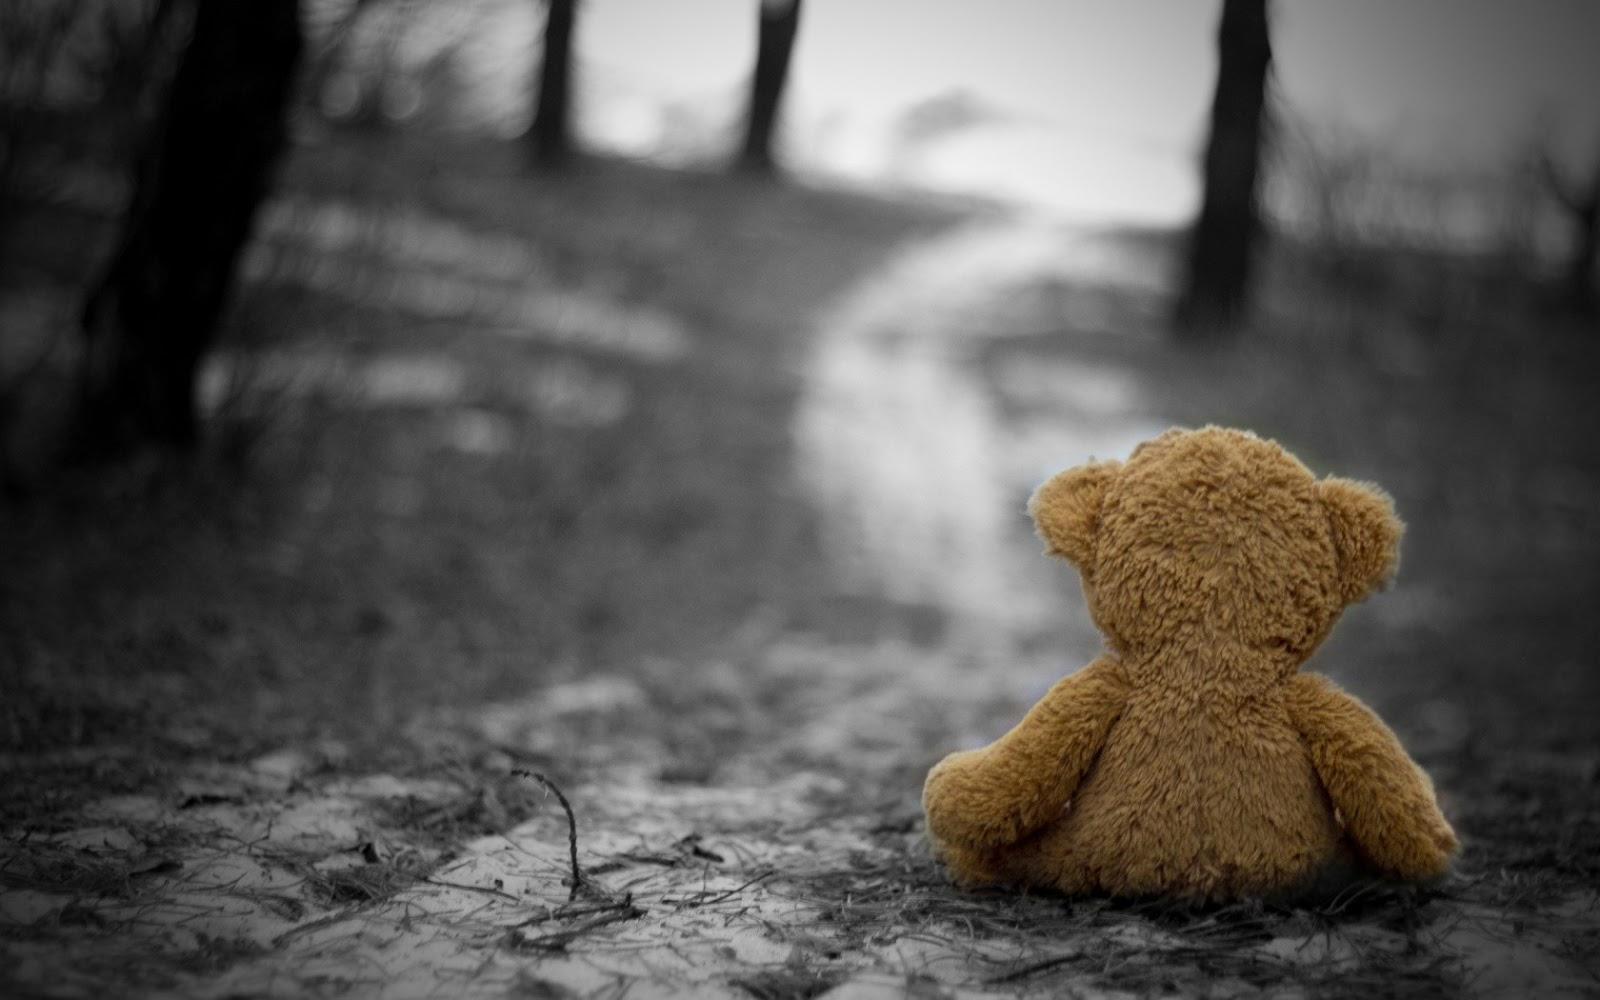 merasa kehilangan sahabat, merasa kehilangan seseorang, merasa kehilangan dalam bahasa inggris, merasa kehilangan tujuan hidup, merasa kehilangan mp3